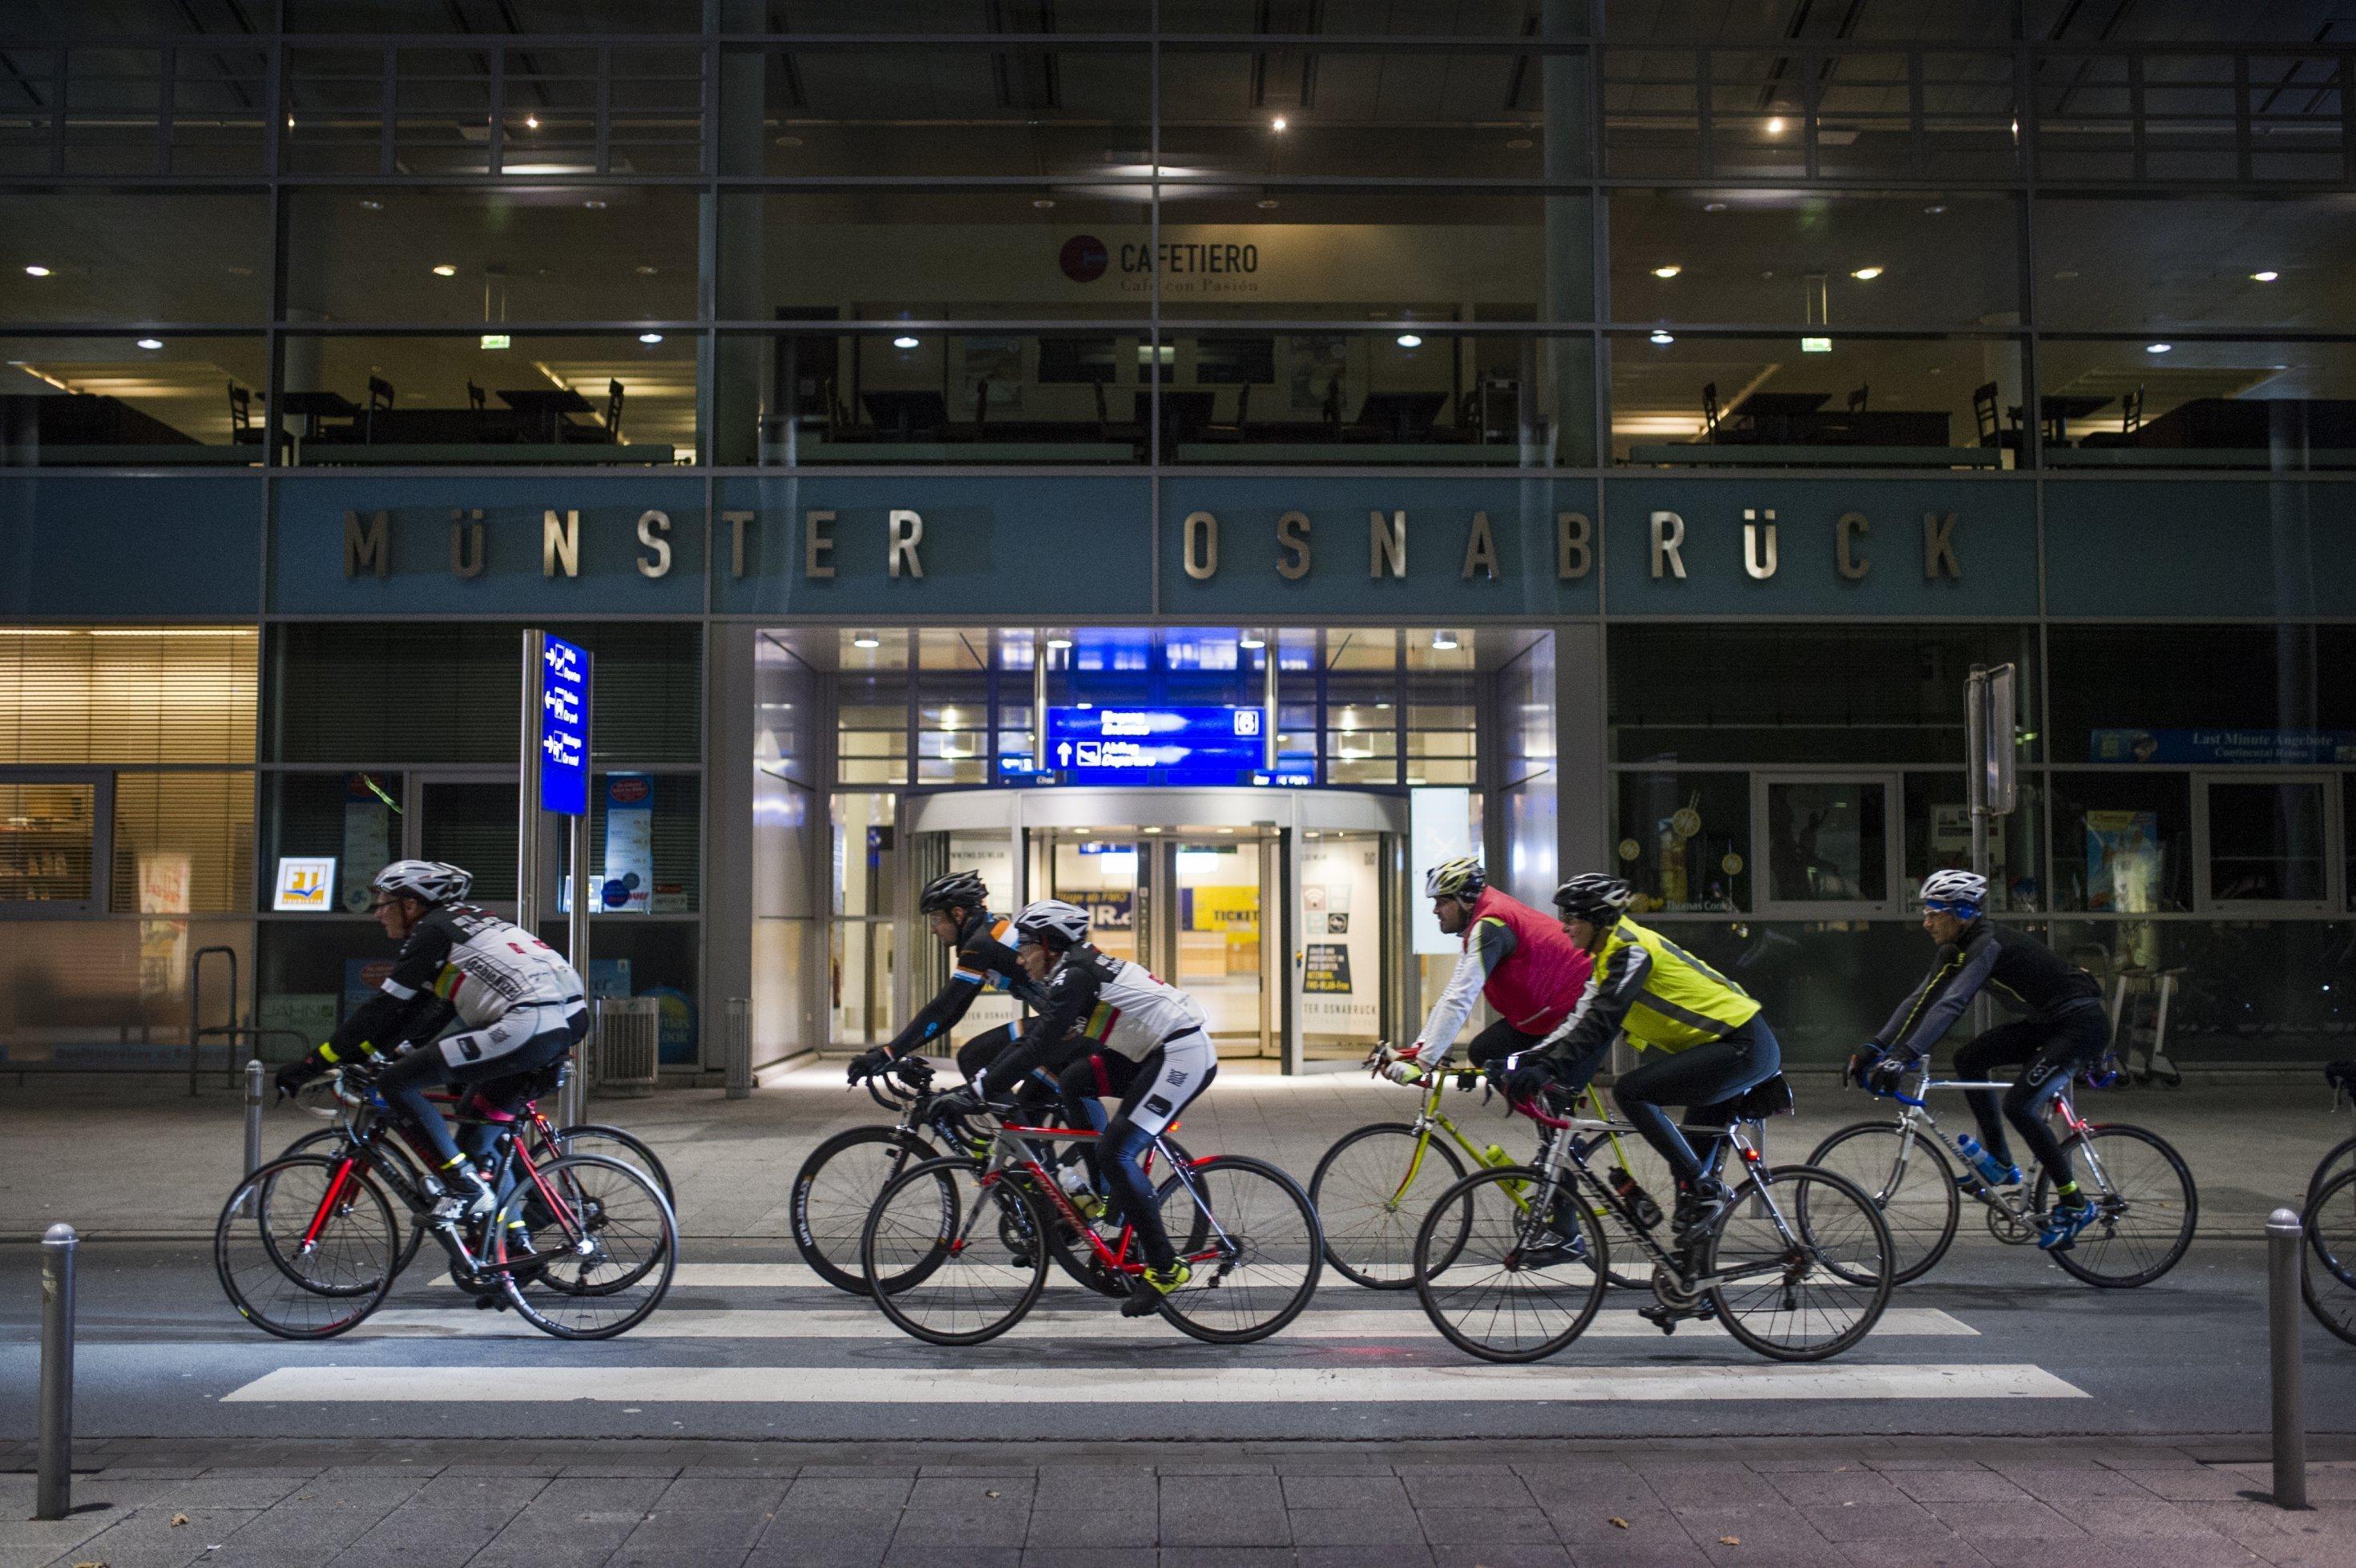 Trainingsgruppe vor dem Eingang zum Flughafen Münster